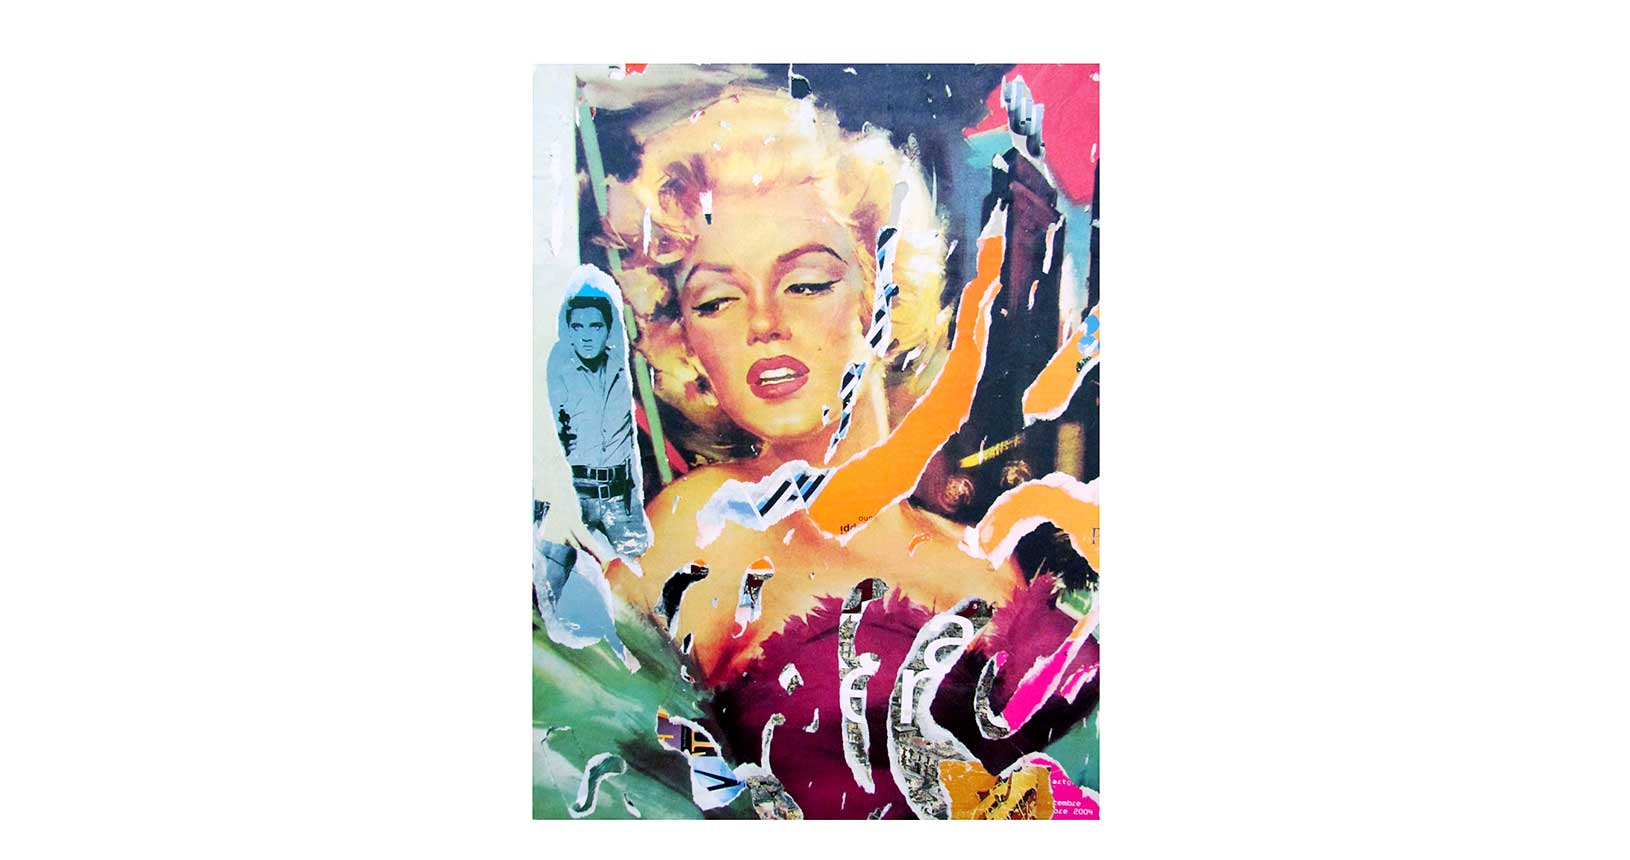 art vintage iconic design furniture riccardo serafini mimmo rotella jacques villeglè arte contemporanea street art raymond hains asphalt jungle marilyn monroe